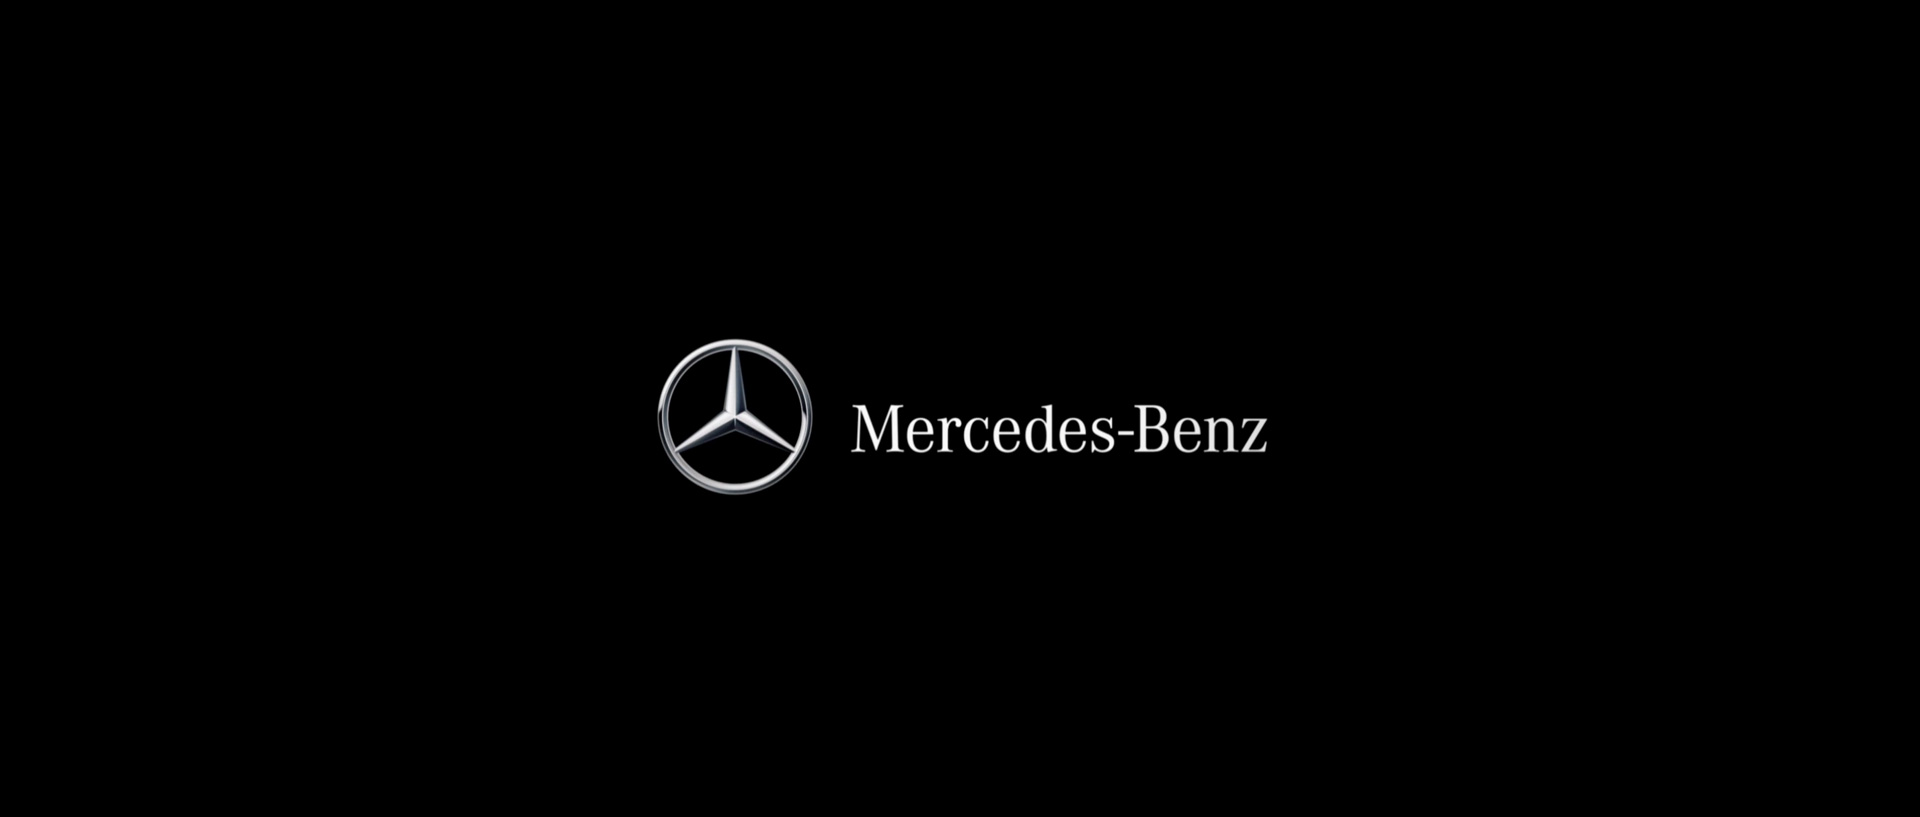 Mercedes Logo Wallpaper 1920x817